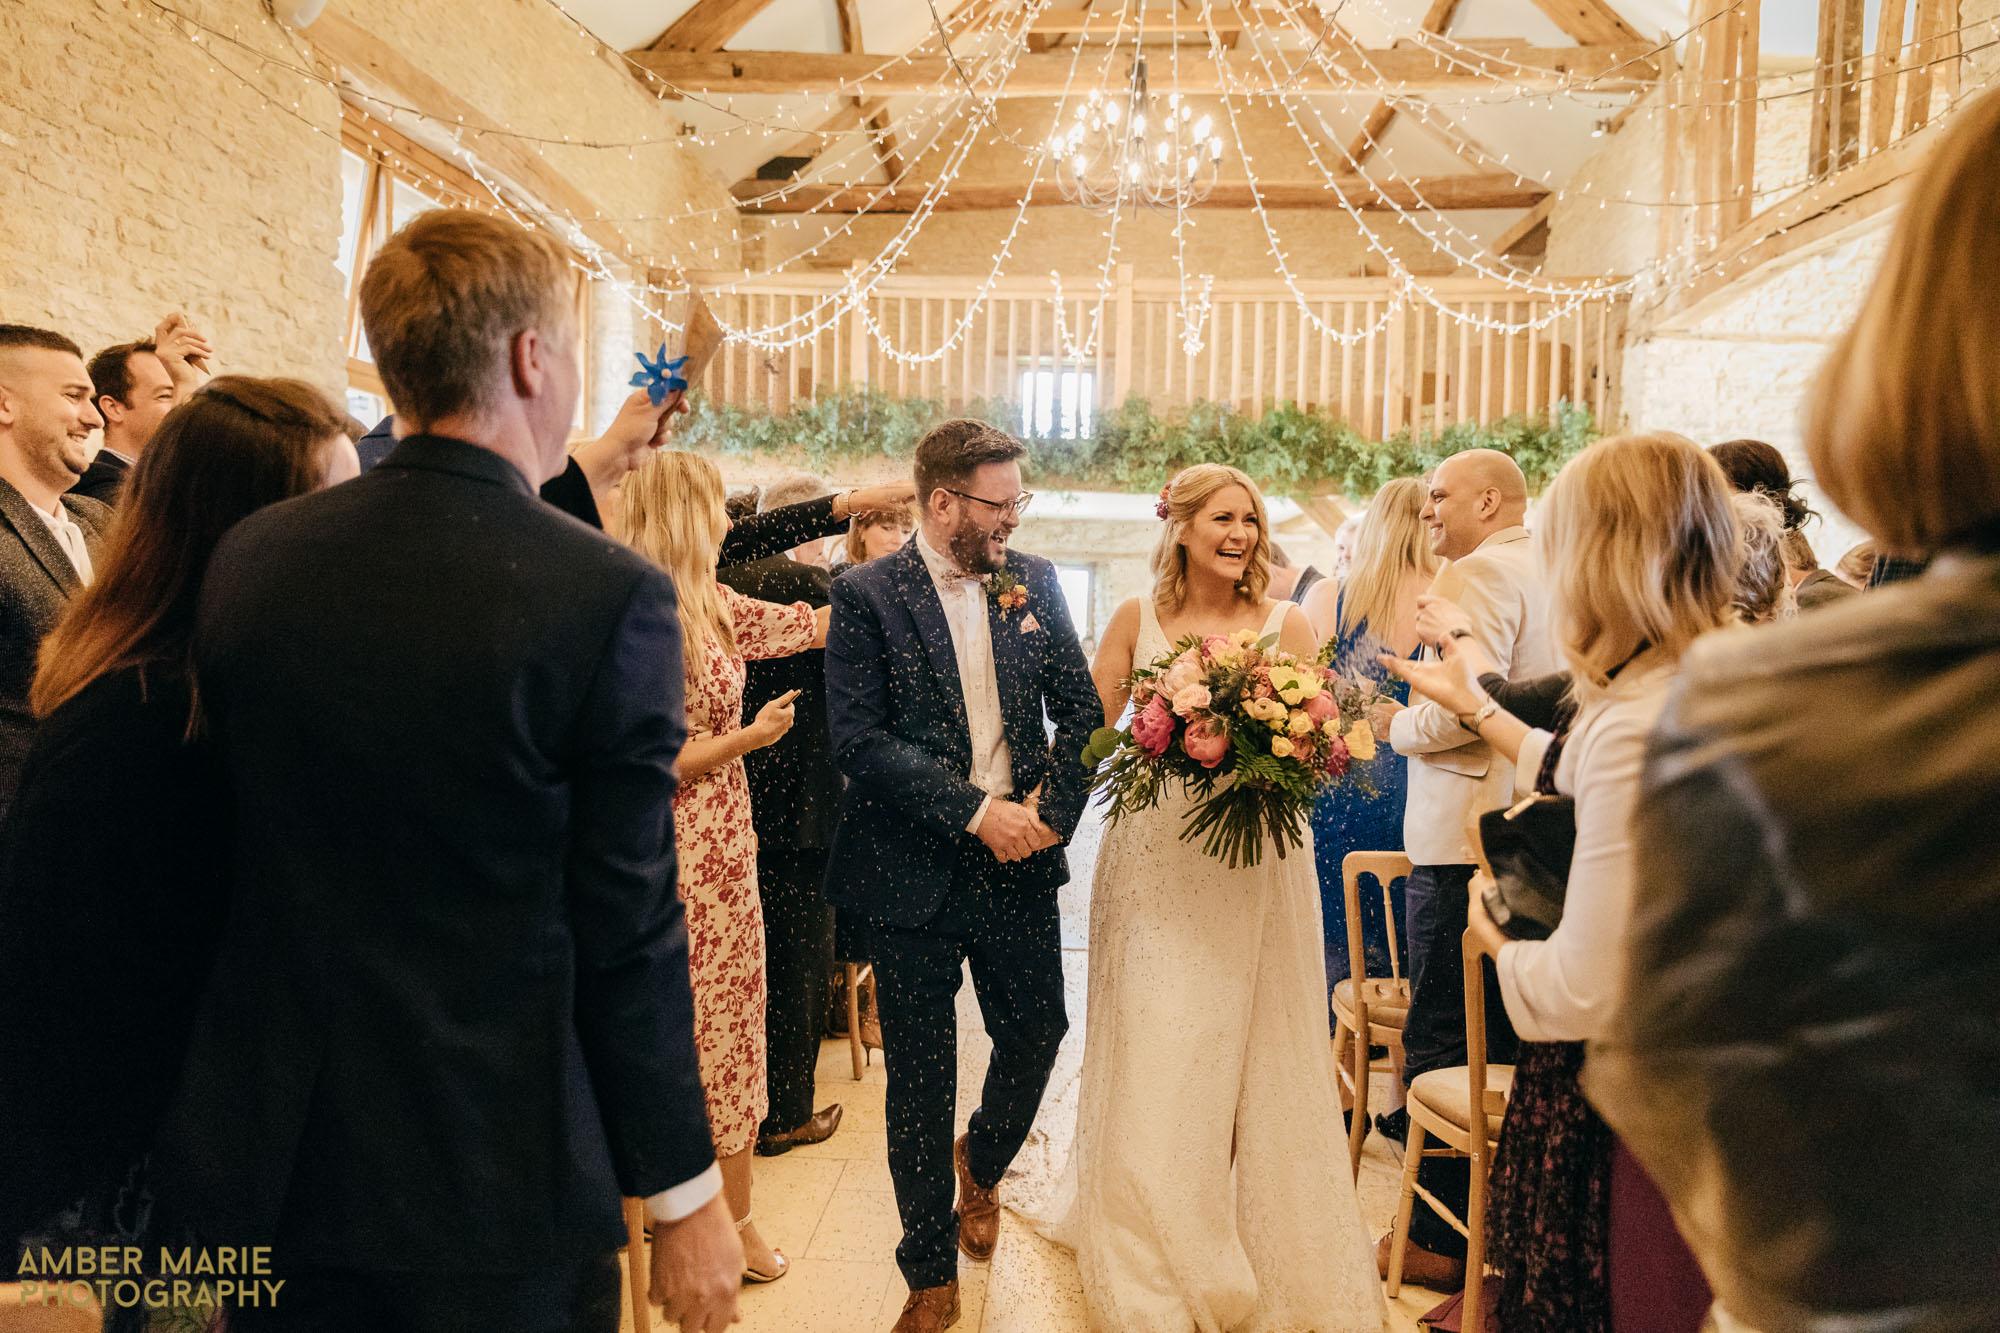 kingscote barn wedding photography